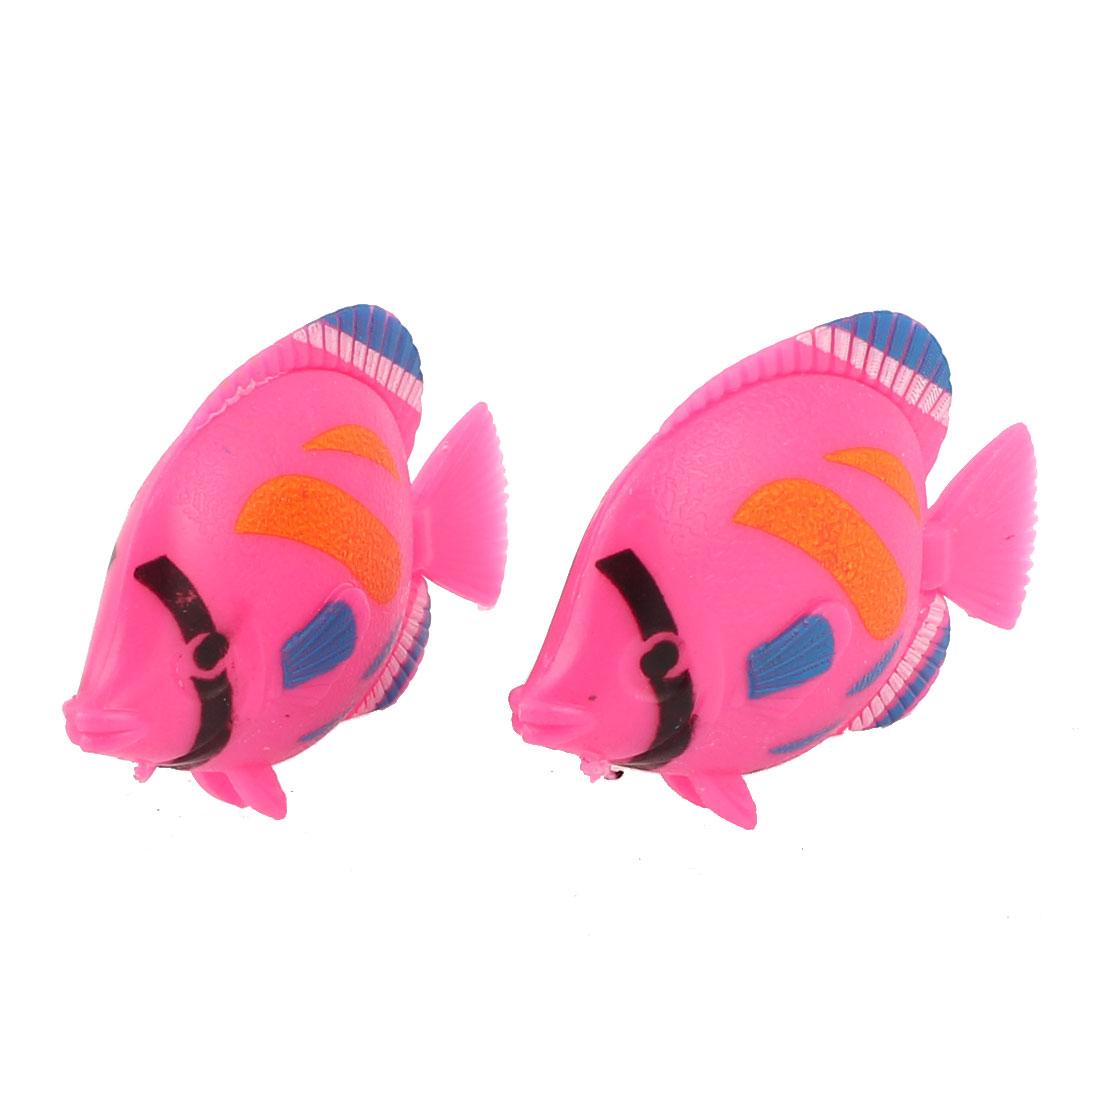 2Pcs Plastic Artificial Swing Tail Floating Fish Aquarium Decor Pink